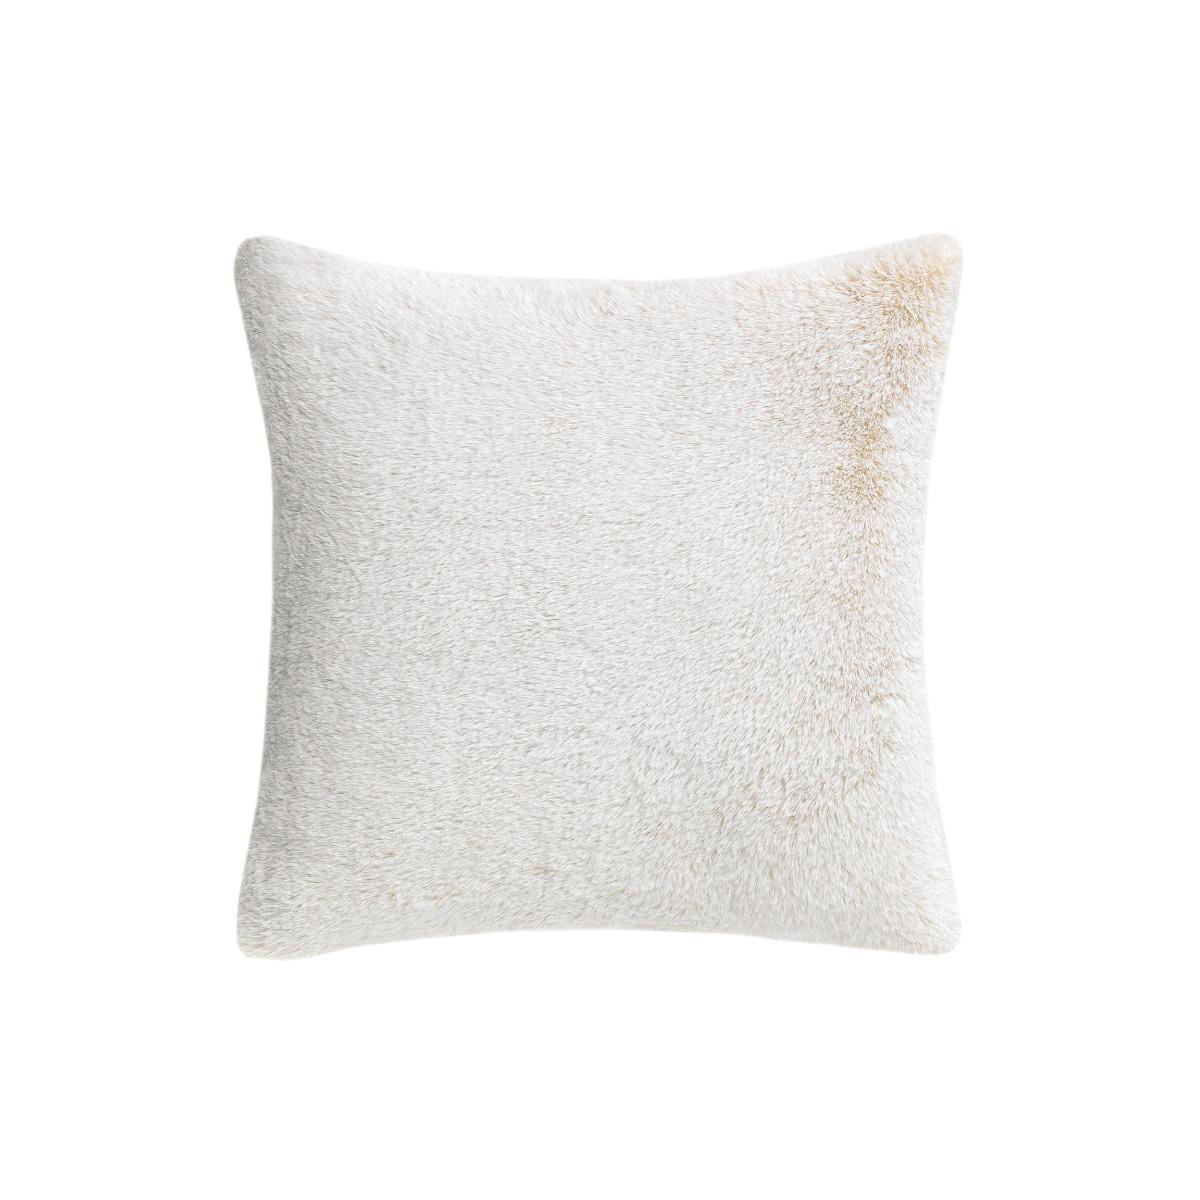 Подушка декор Togas амара жемчужный 45x45. 1 пр